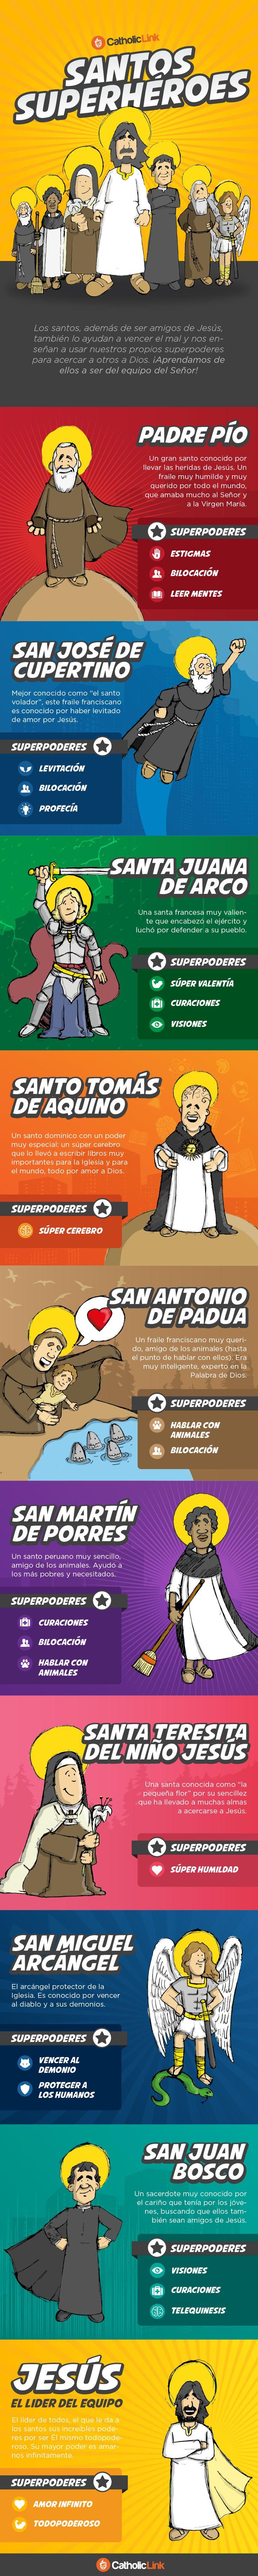 Info Santos Superheroes-01